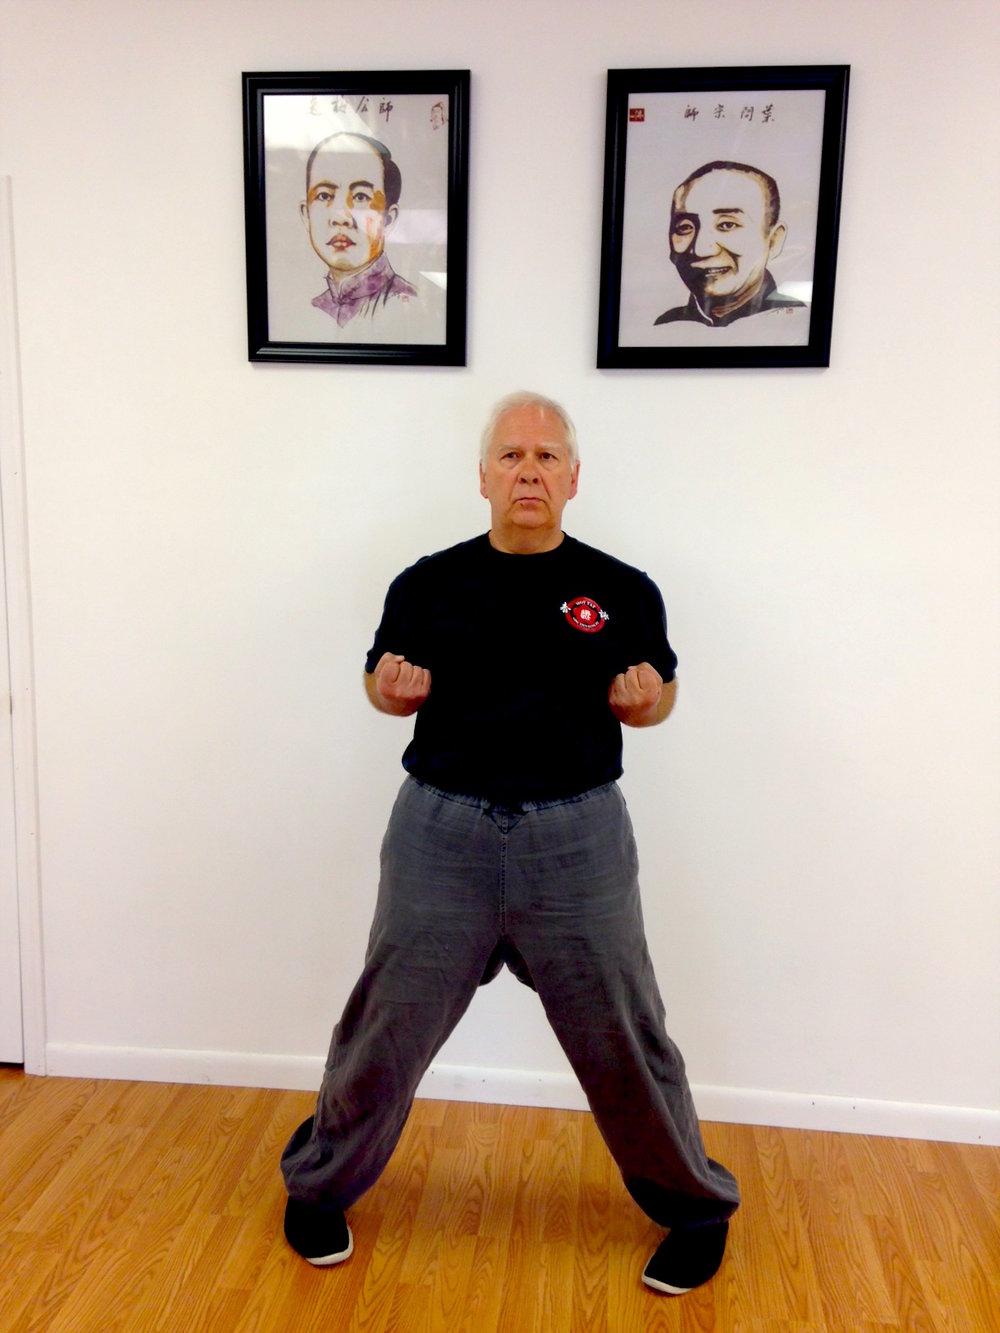 Sifu Urz Mueller of New River Valley Moy Yat Kung Fu